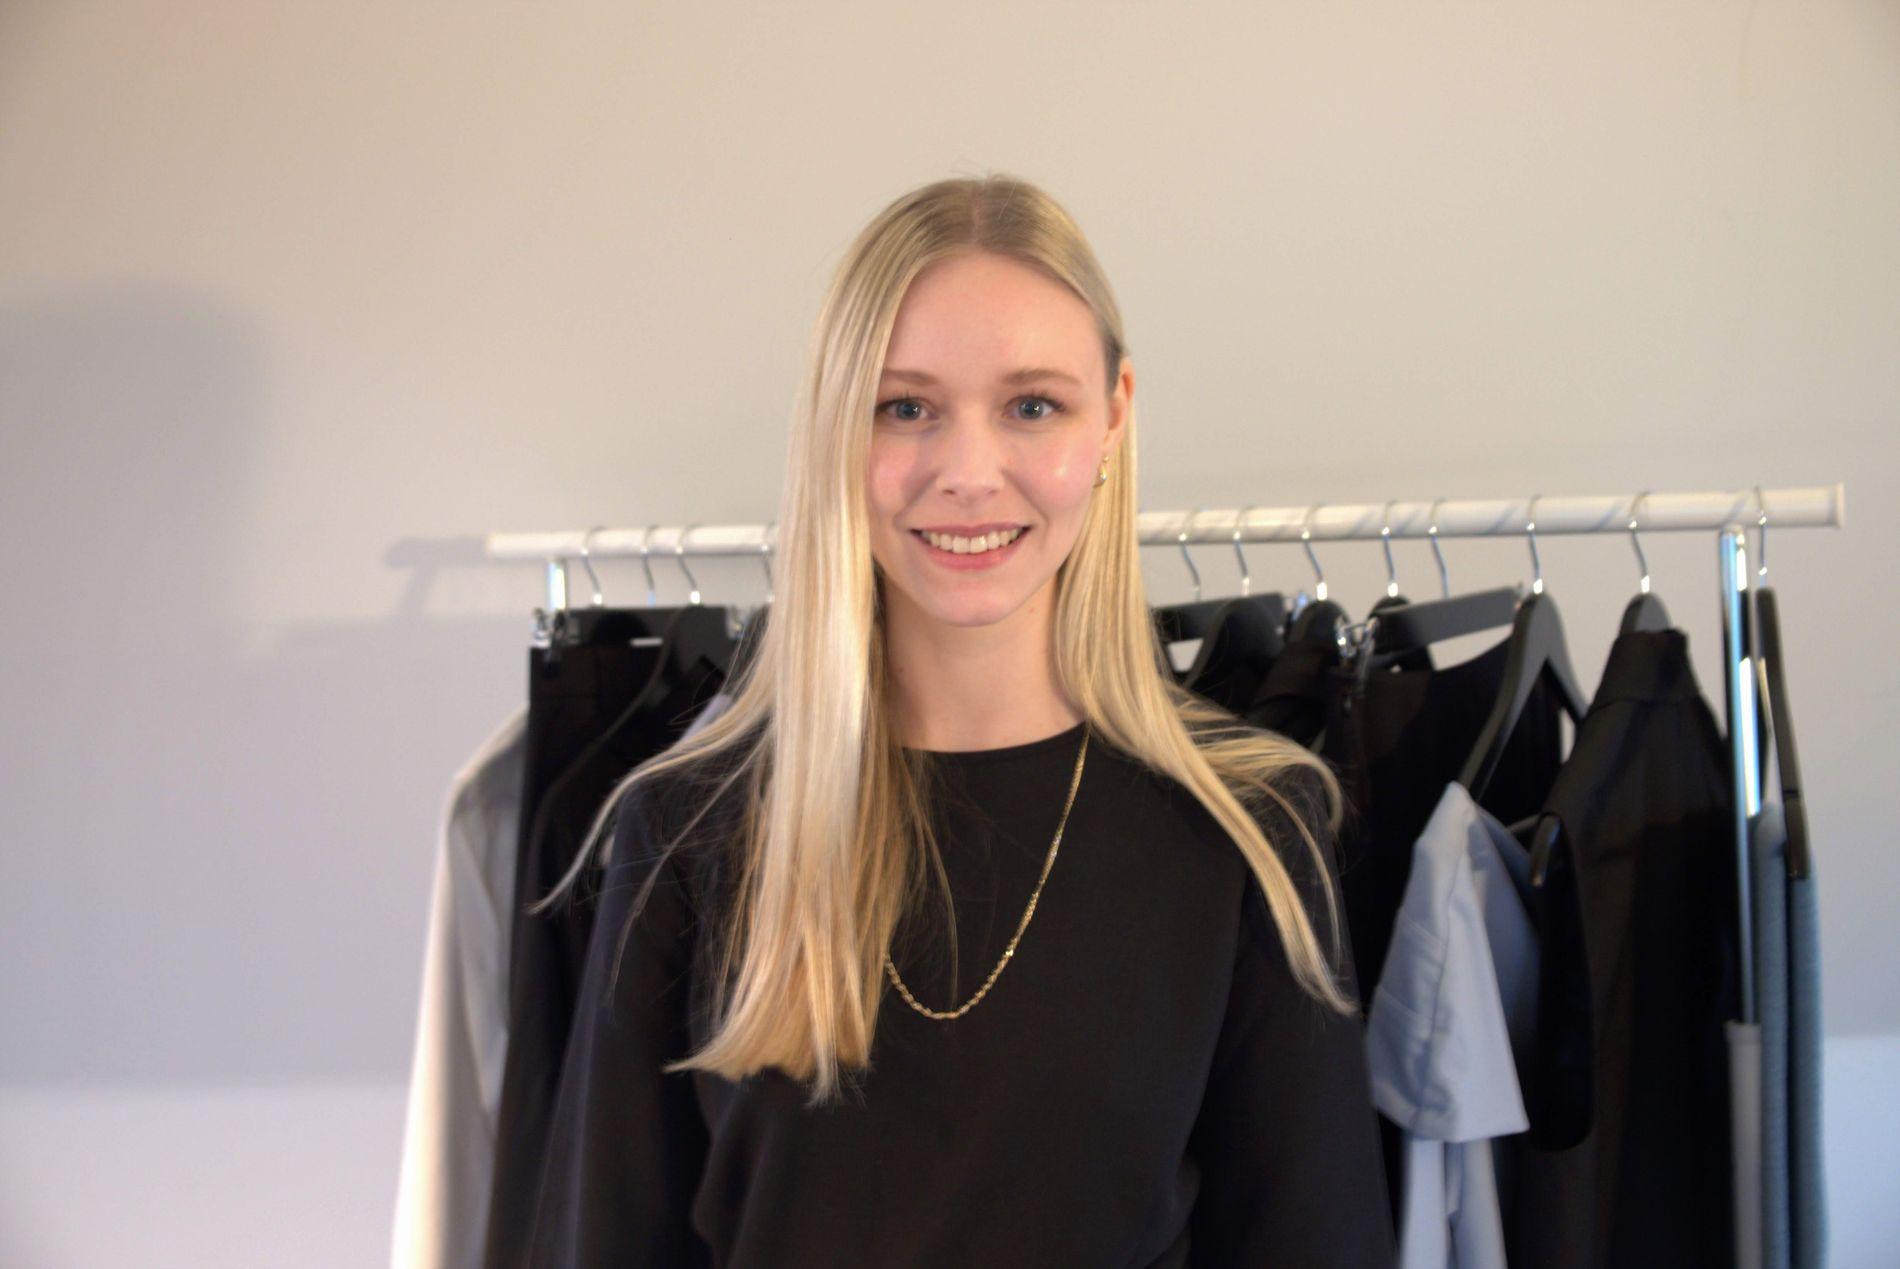 Susanne (29) fra Stavanger satser på designdrømmen: – Jeg